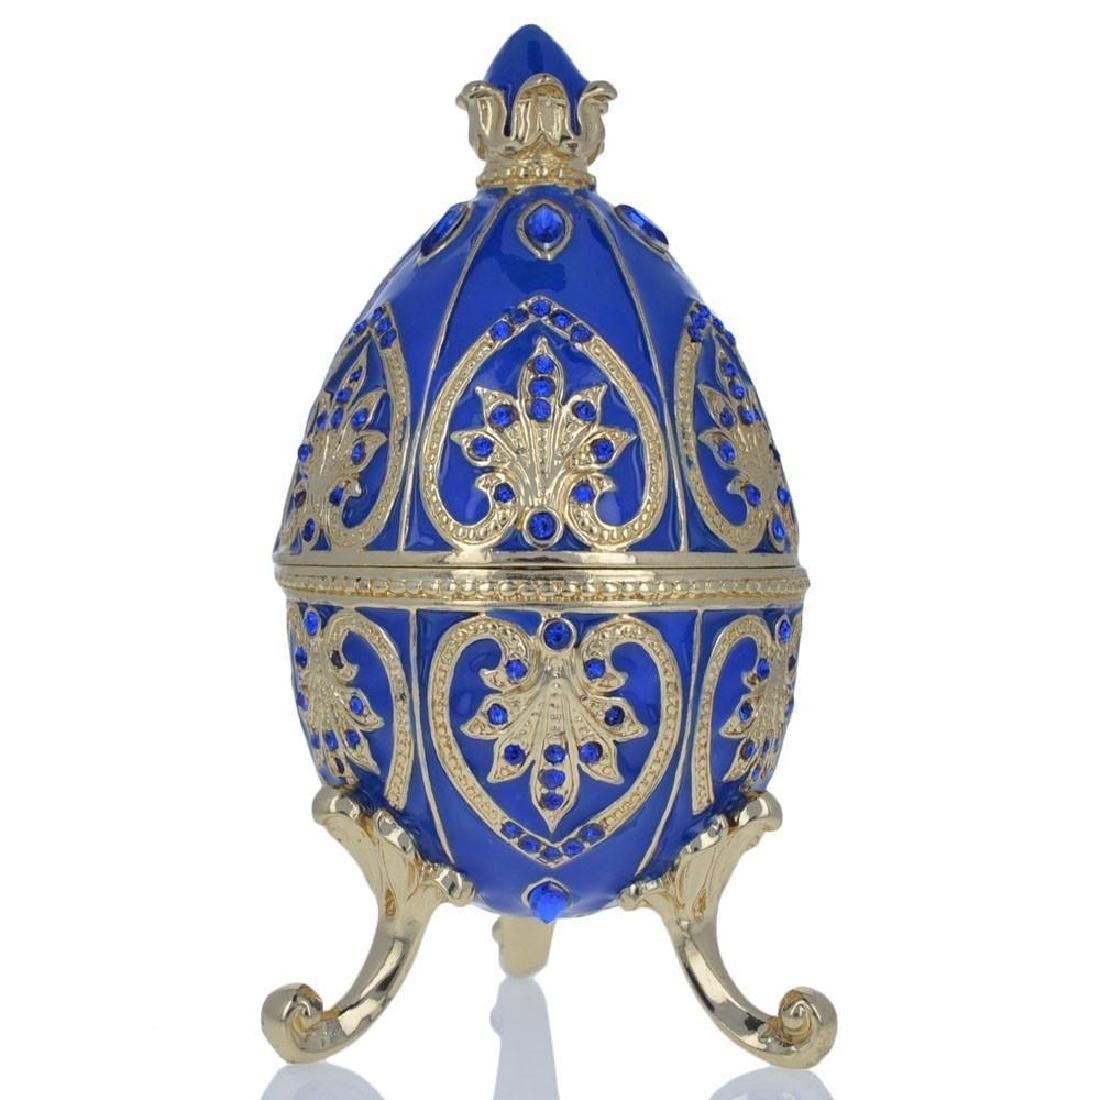 "4.5"" Blue Jewel Royal Crown Faberge Inspired Easter Egg"